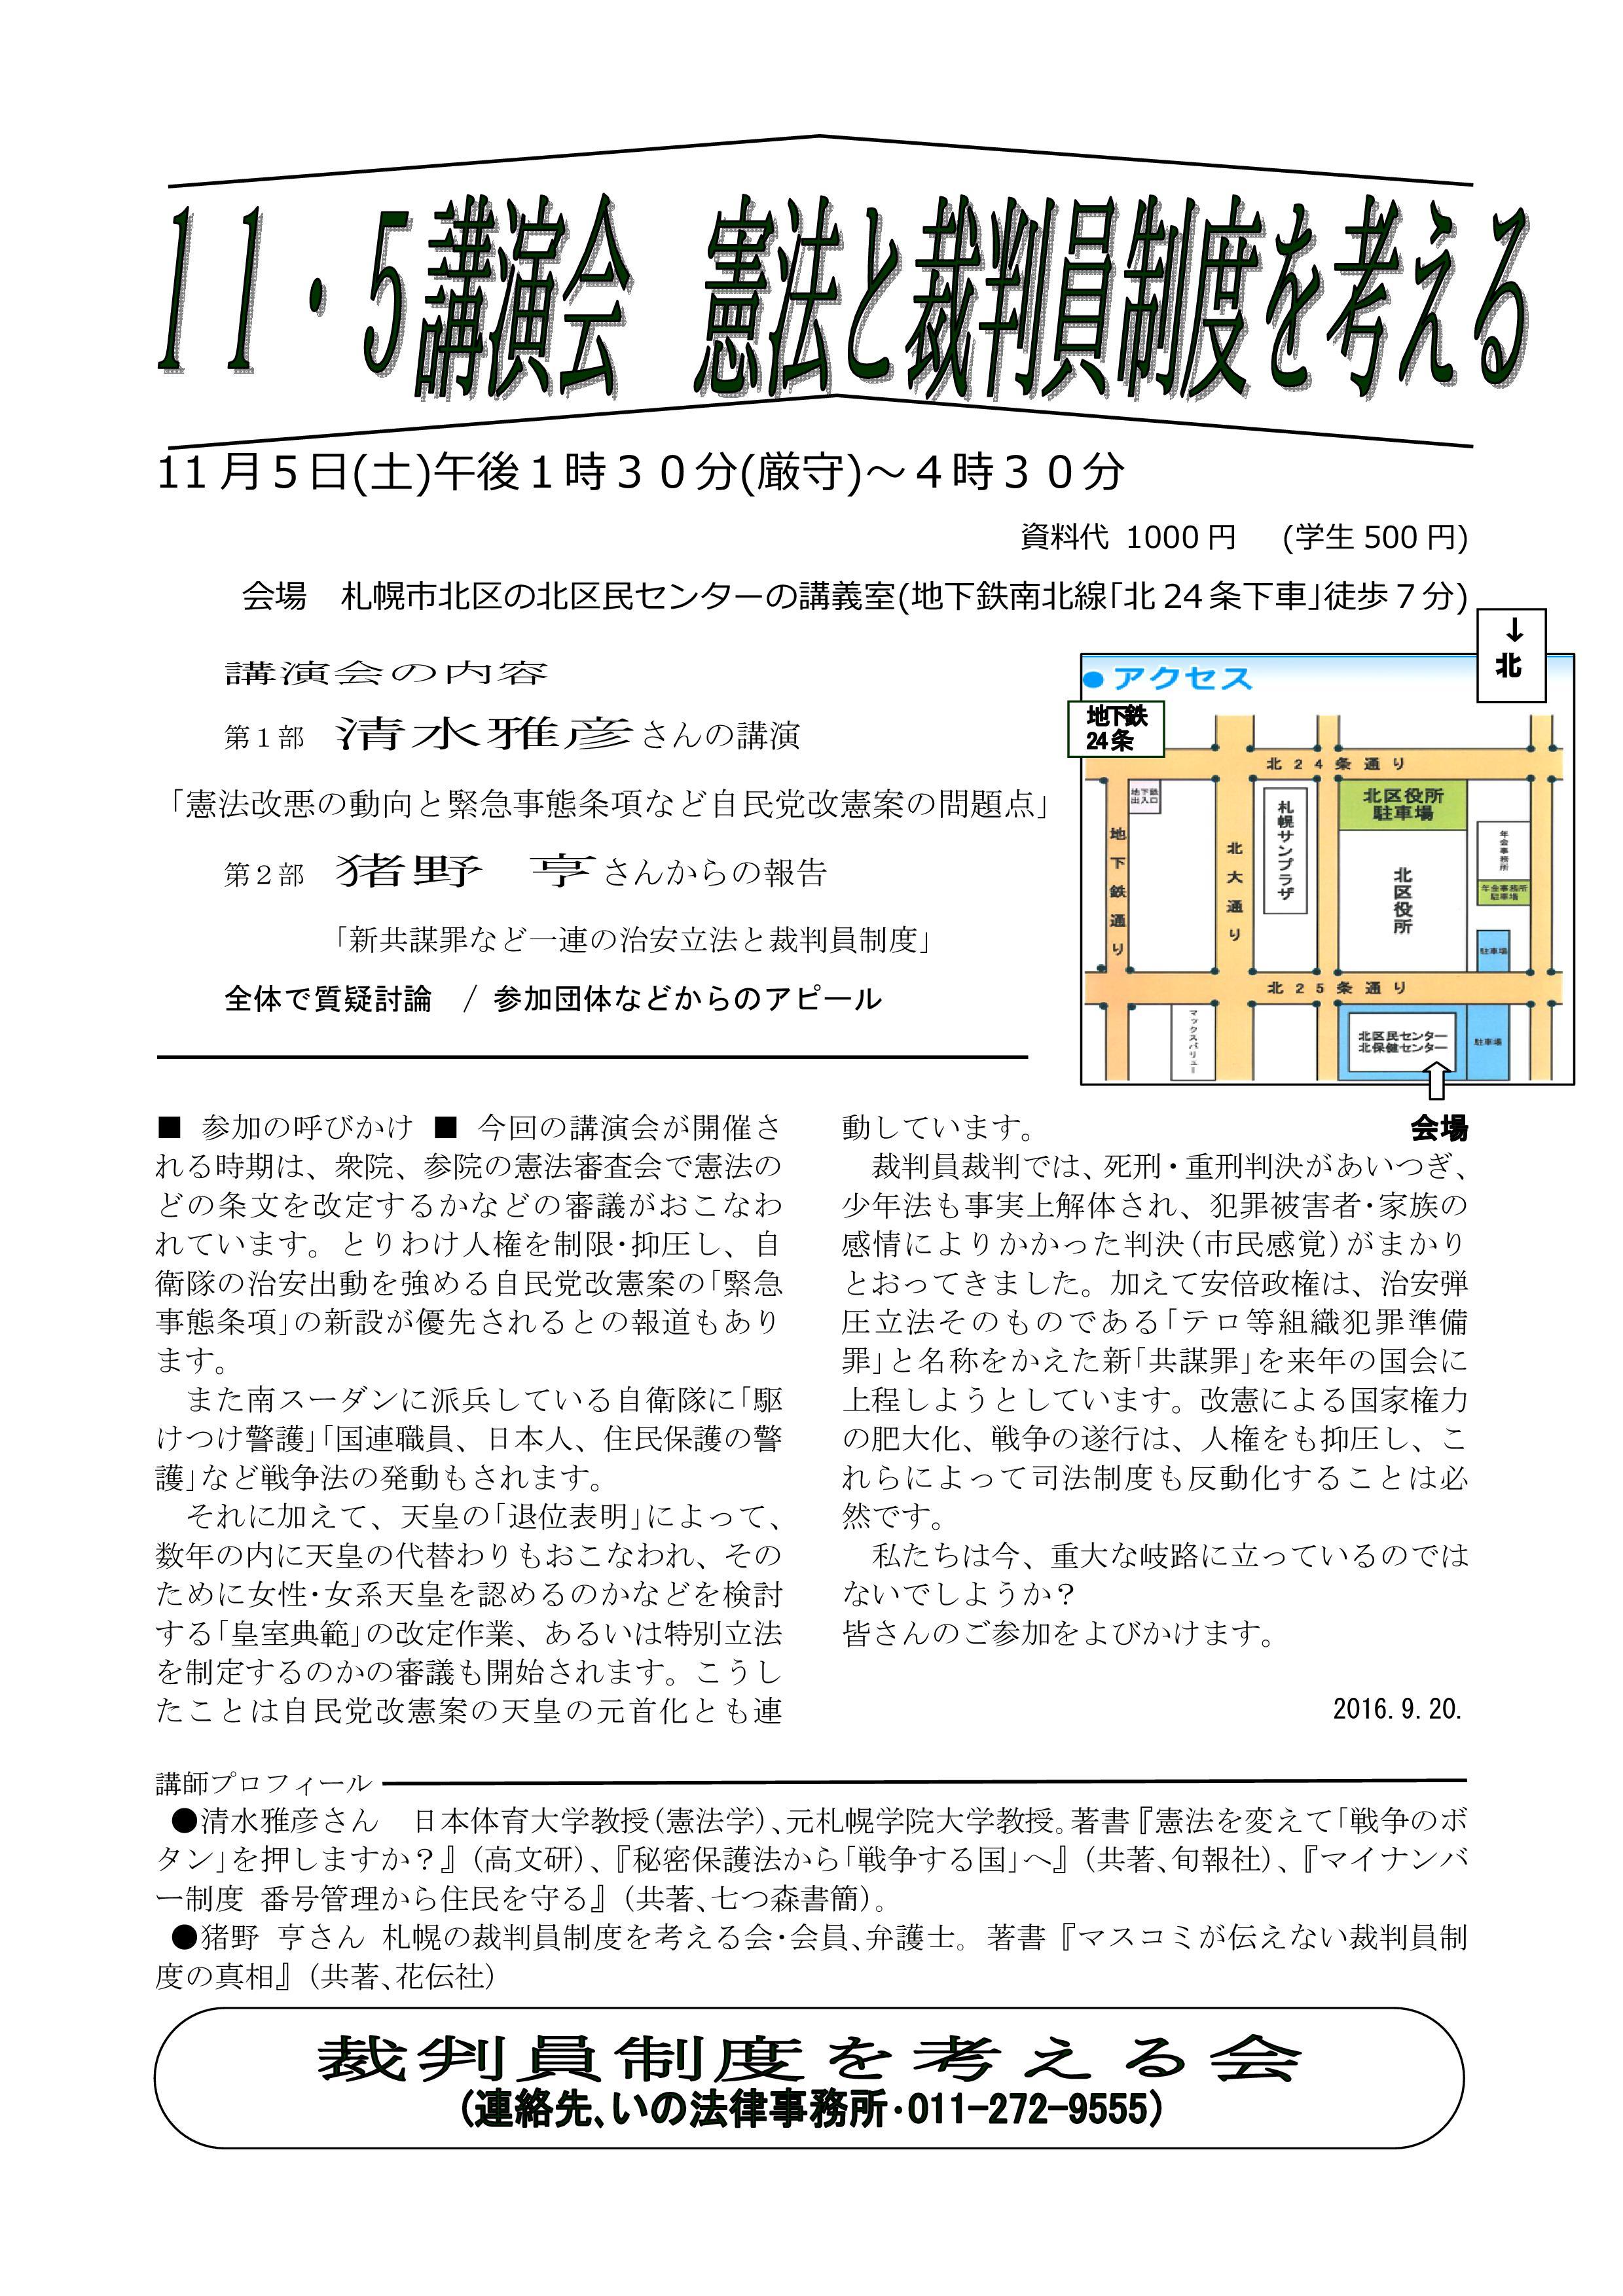 Microsoft Word - 裁判員講演会